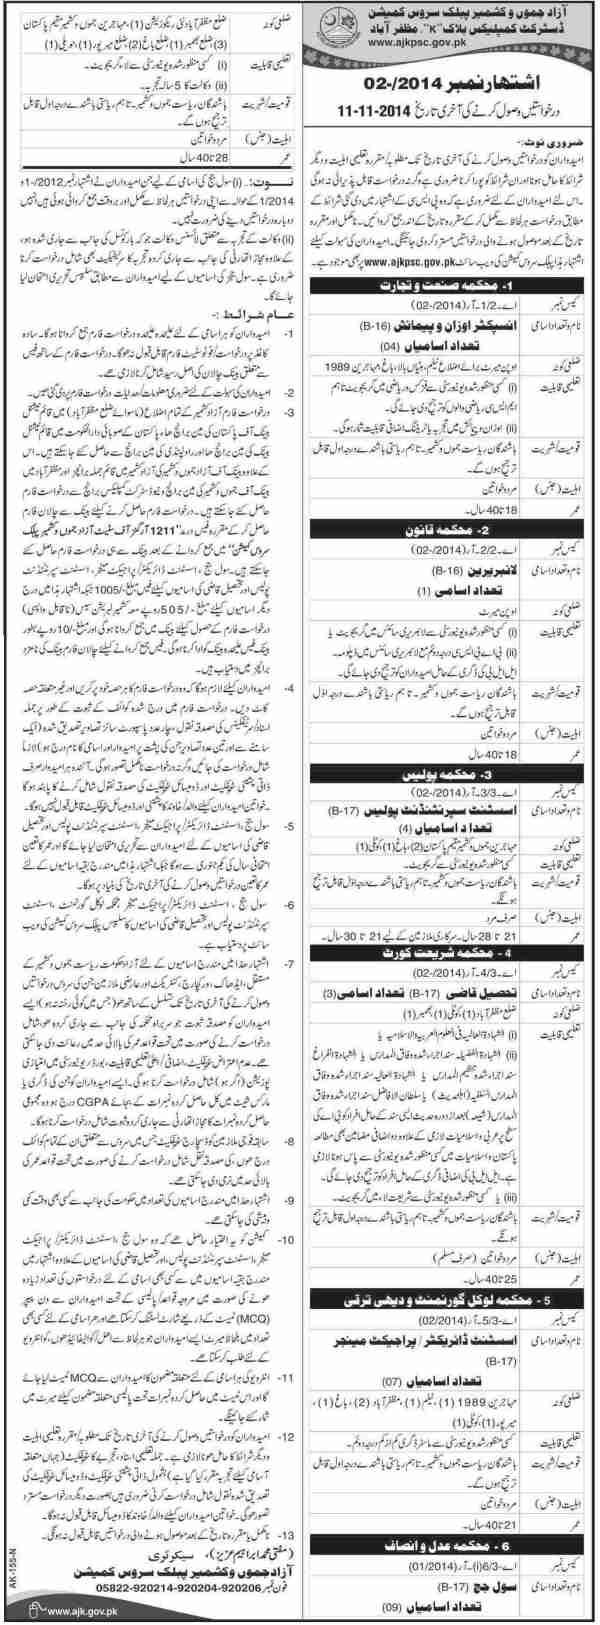 AJK PSC Jobs 2016 Eligibility Criteria Application Form Download Azad Jammu Kashmir